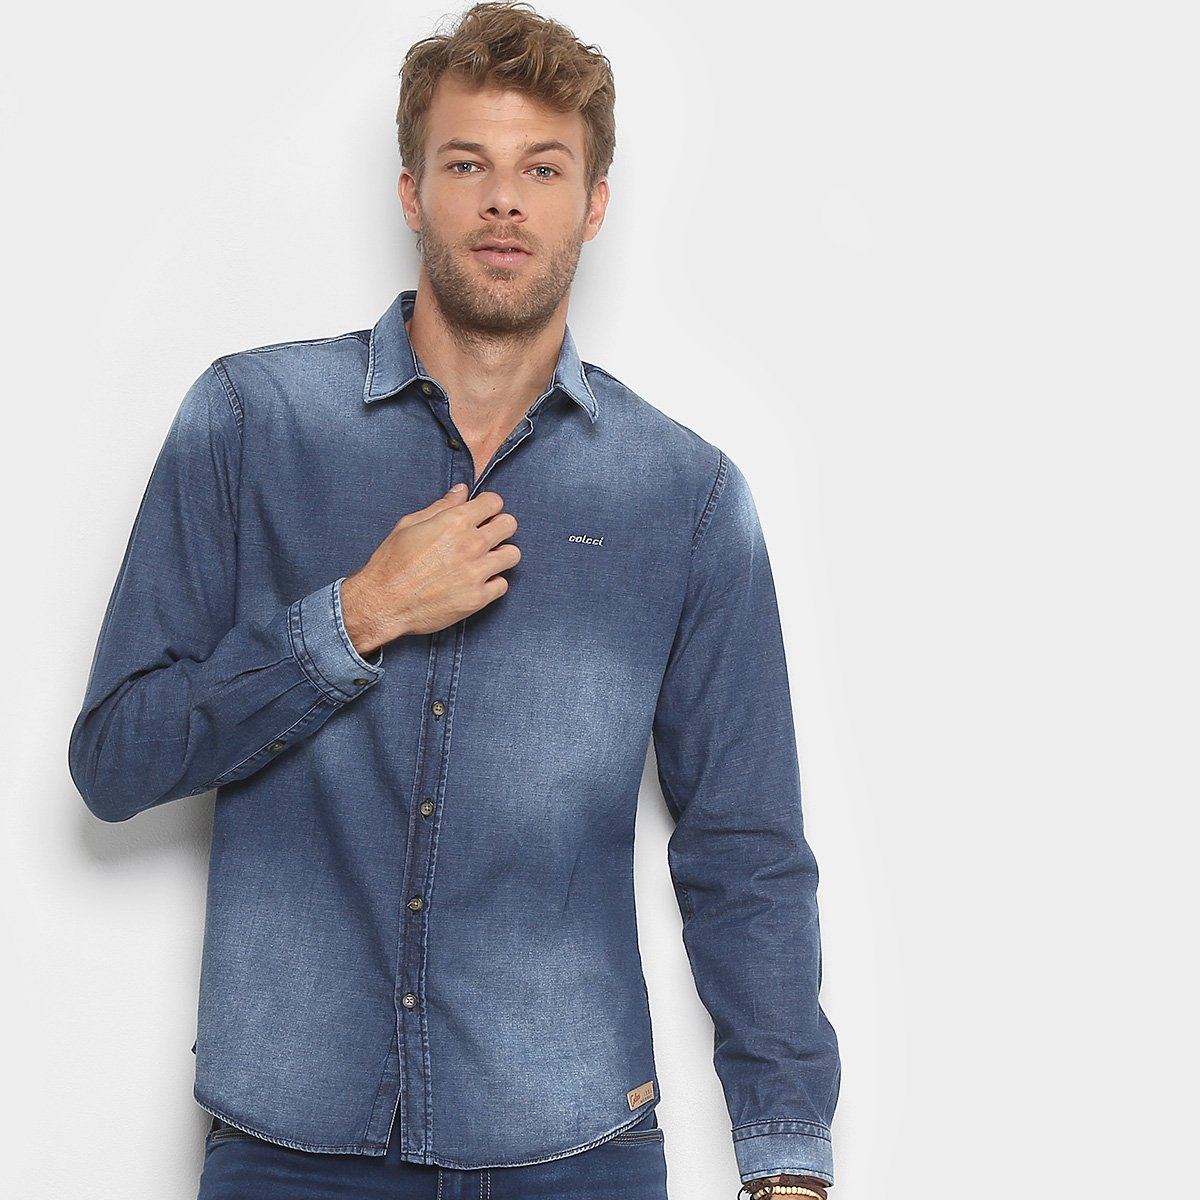 Camisa Jeans Slim Colcci Manga Longa Masculina. undefined bce83427e67